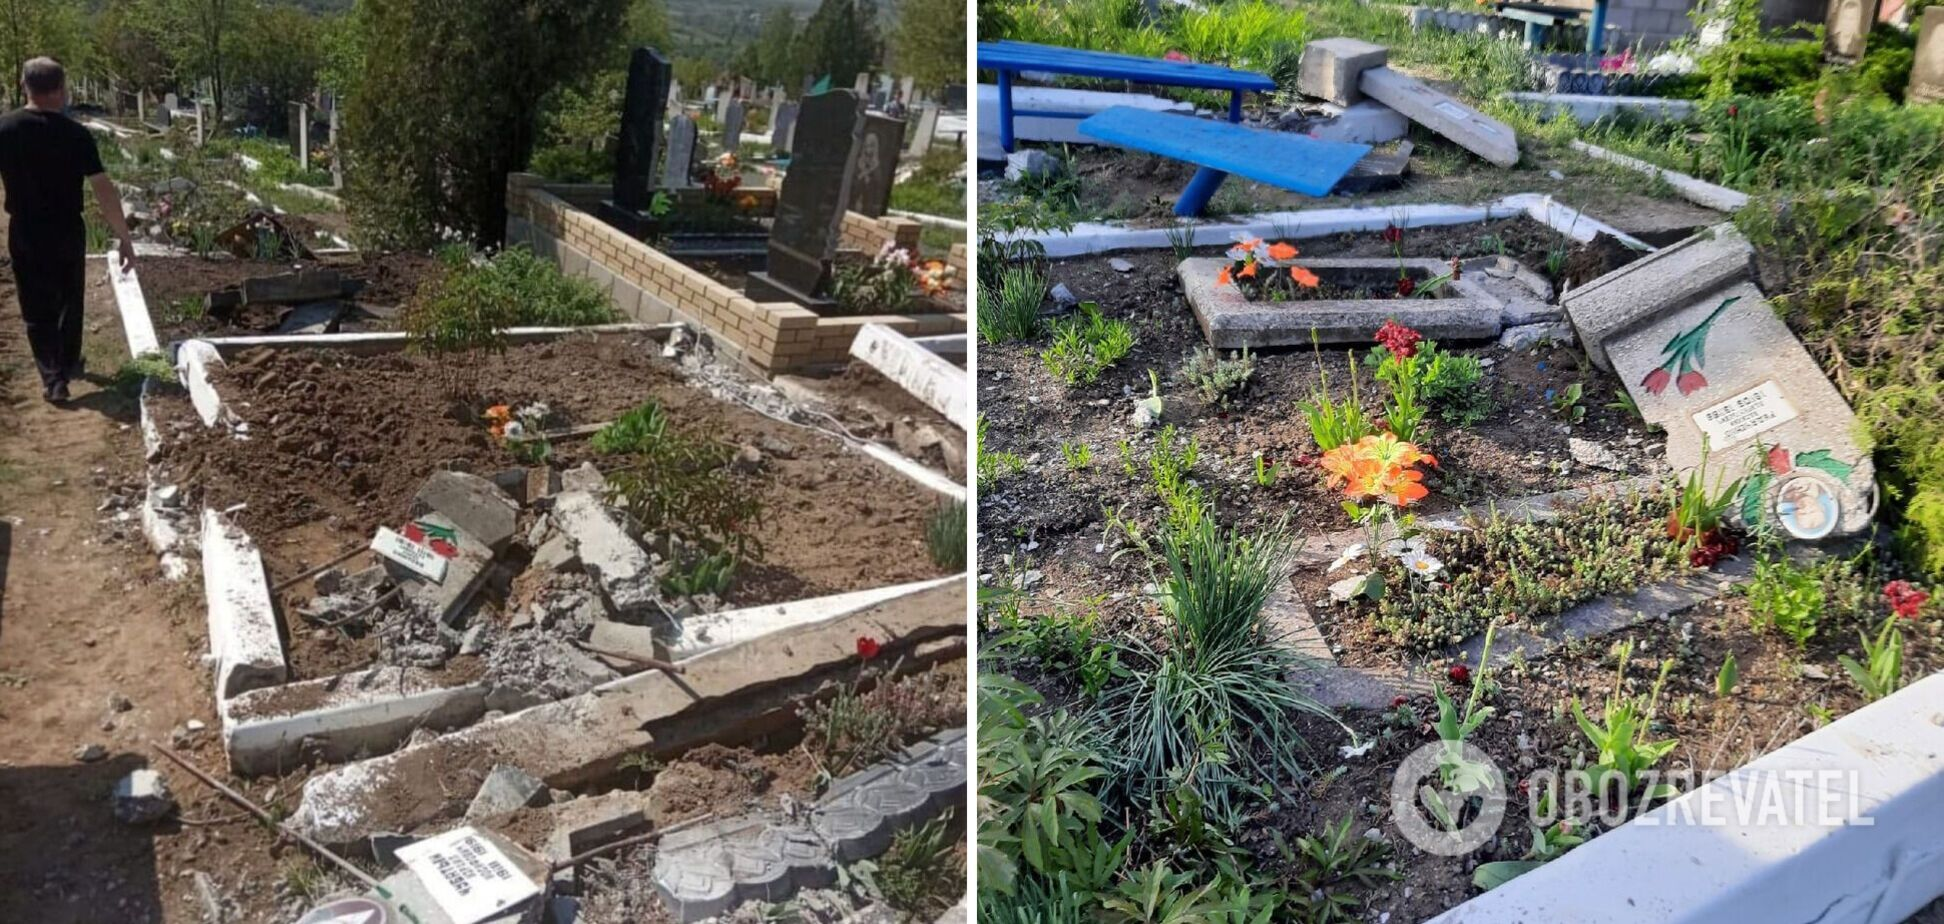 Террористы 'ЛНР' танком уничтожили кладбище на Донбассе. Фото